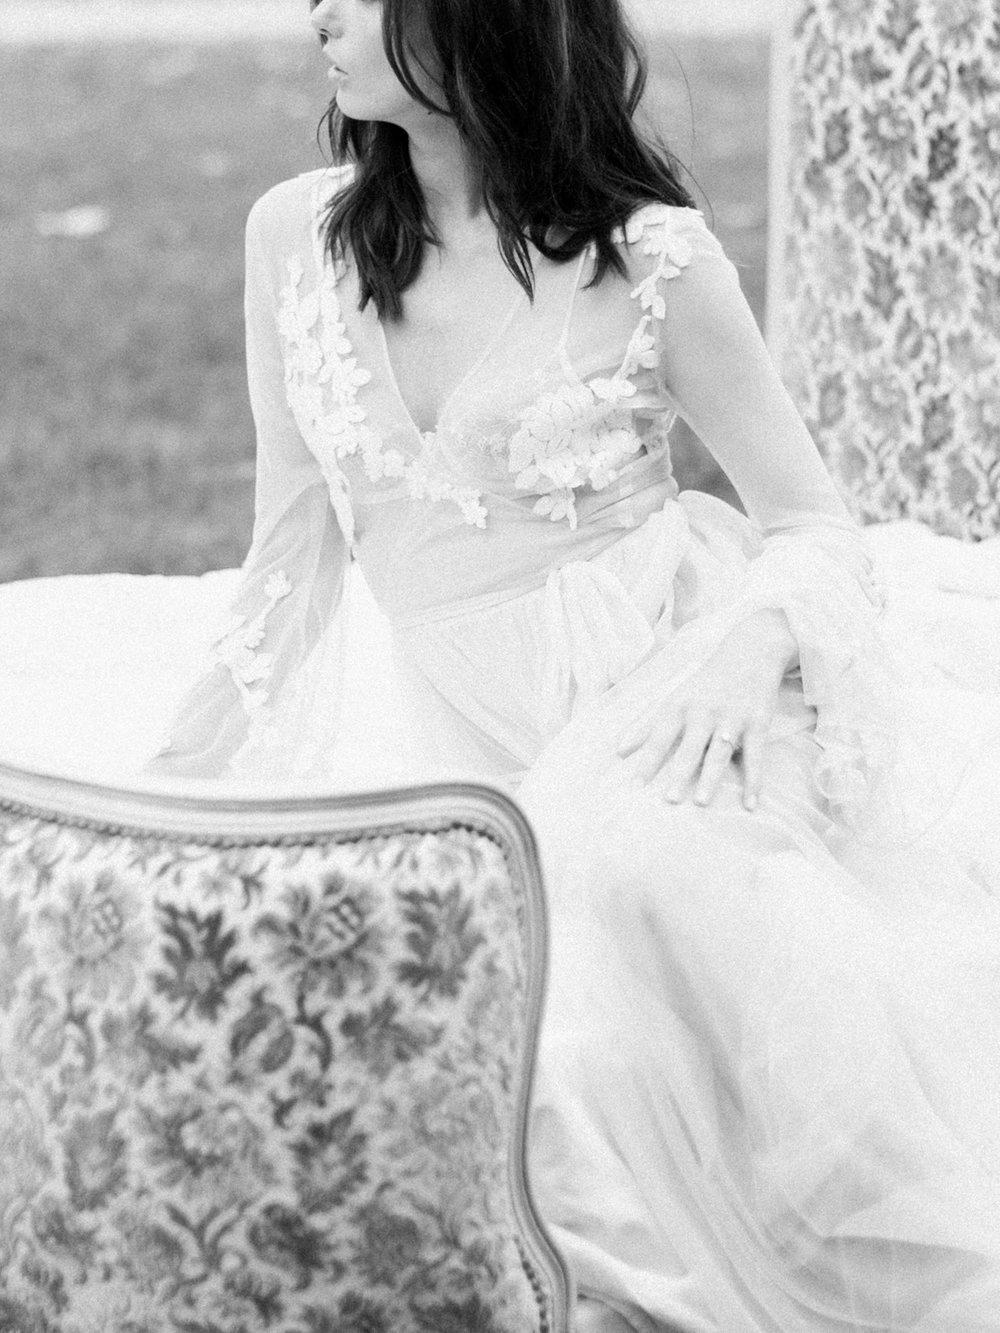 JacquelineAnnePhotography-Boudoir-Outdoors-1-3.jpg